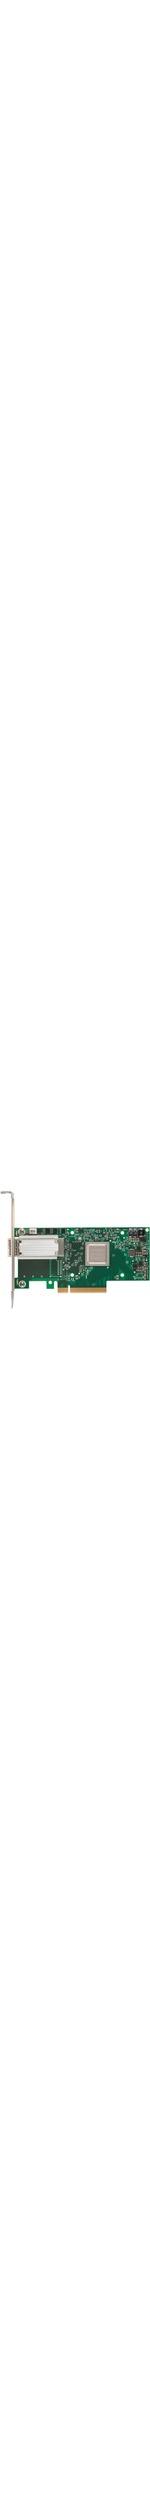 Mellanox ConnectX-4 MCX4111A-ACAT 25Gigabit Ethernet Card - PCI Express 3.0 x8 - 1 Ports - Optical Fiber